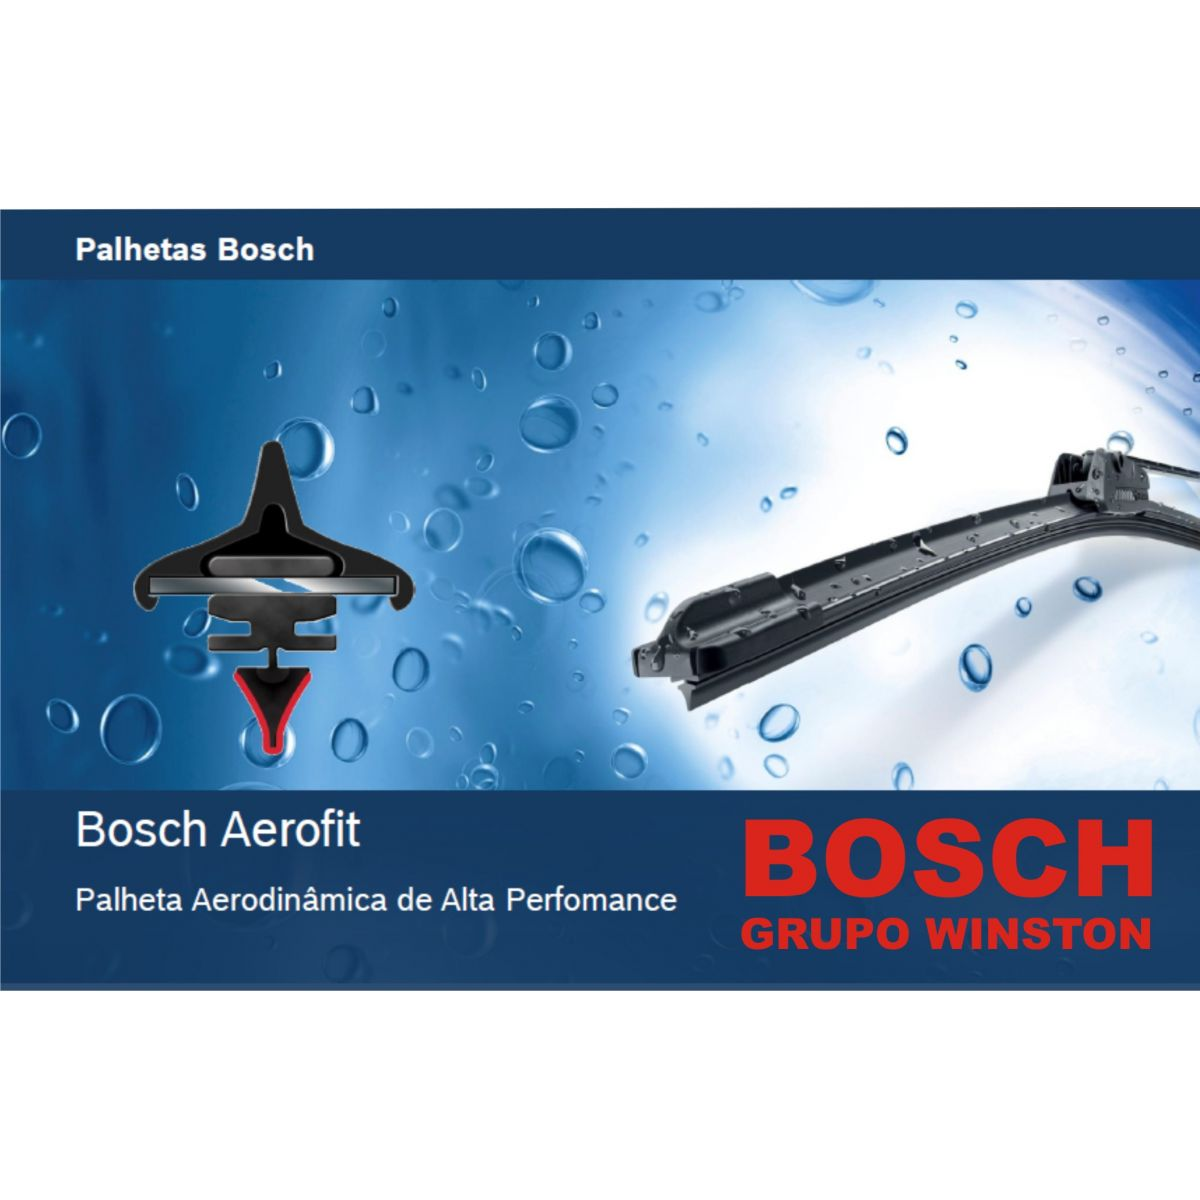 Palheta Bosch Aerofit Limpador de para brisa Bosch MERCEDES BENZ SPRINTER